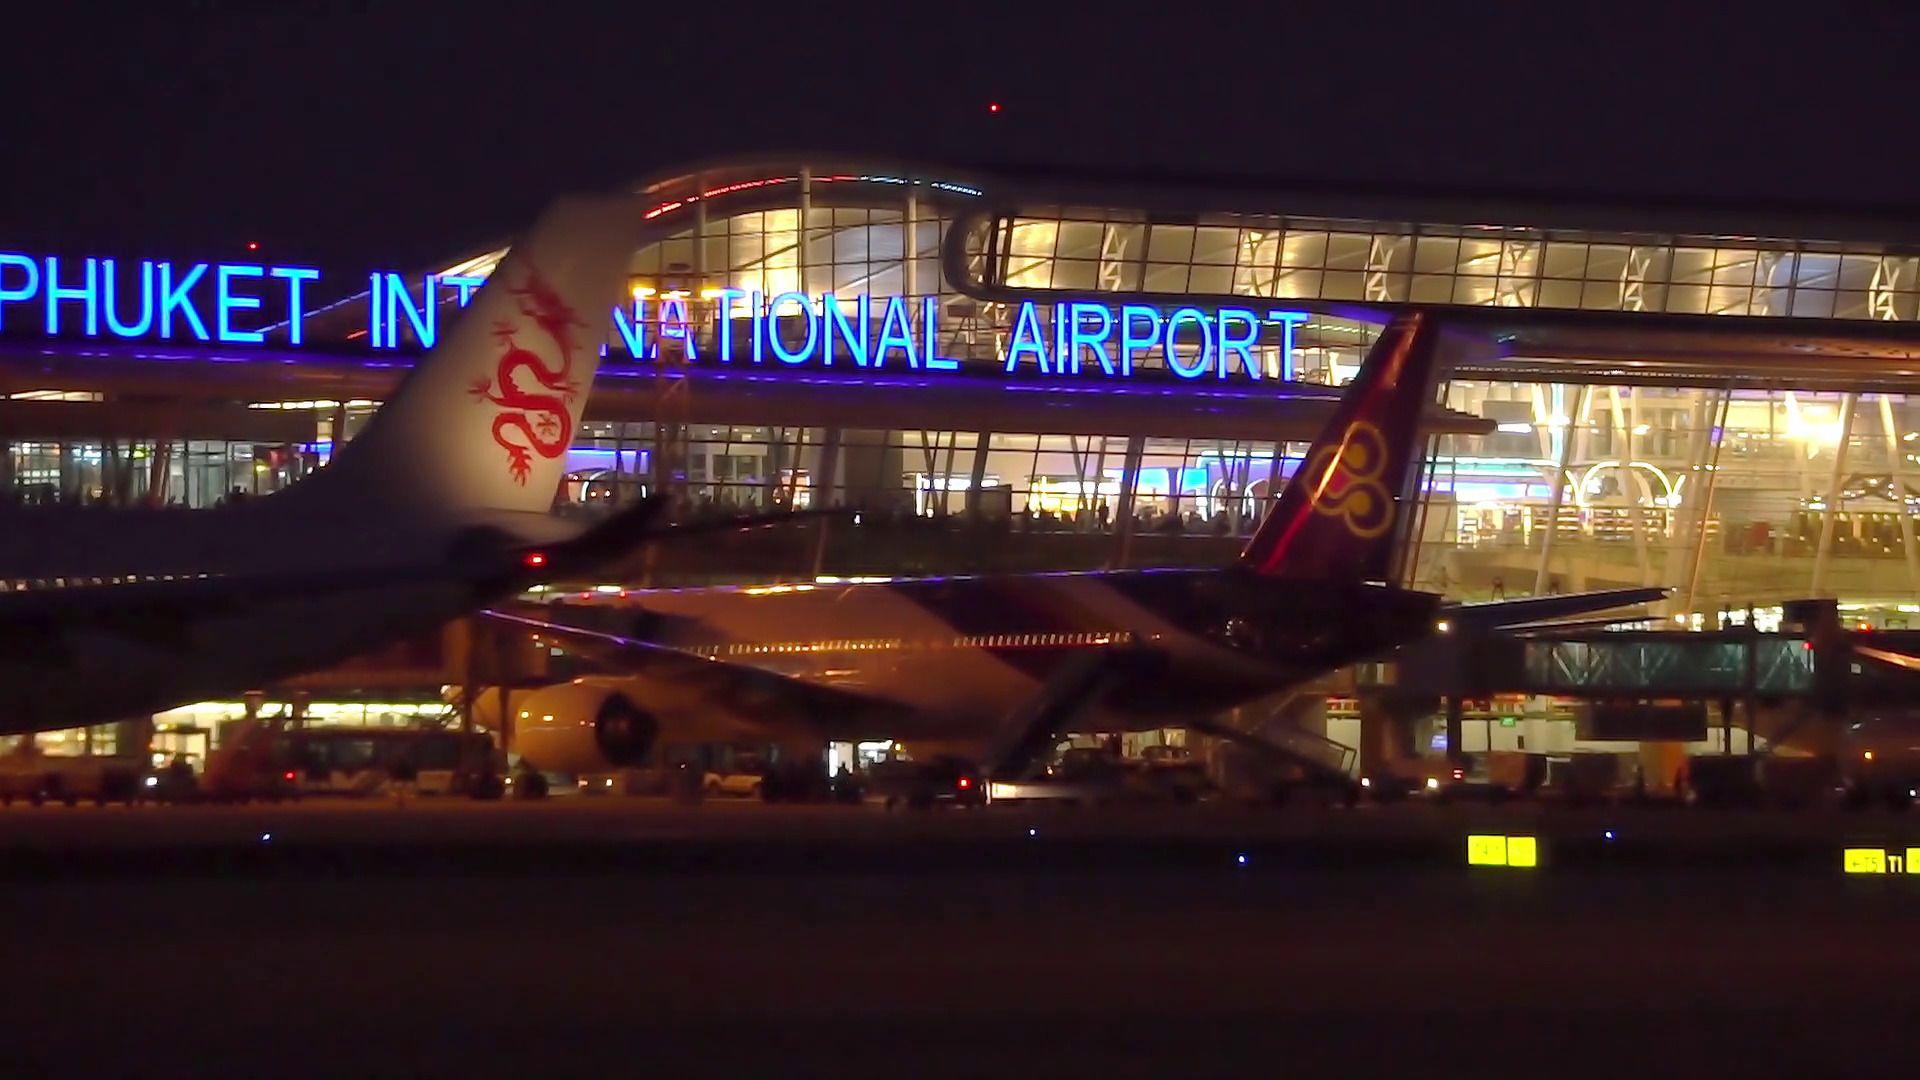 VIP Fast Track Service: Phuket Airport (HKT)